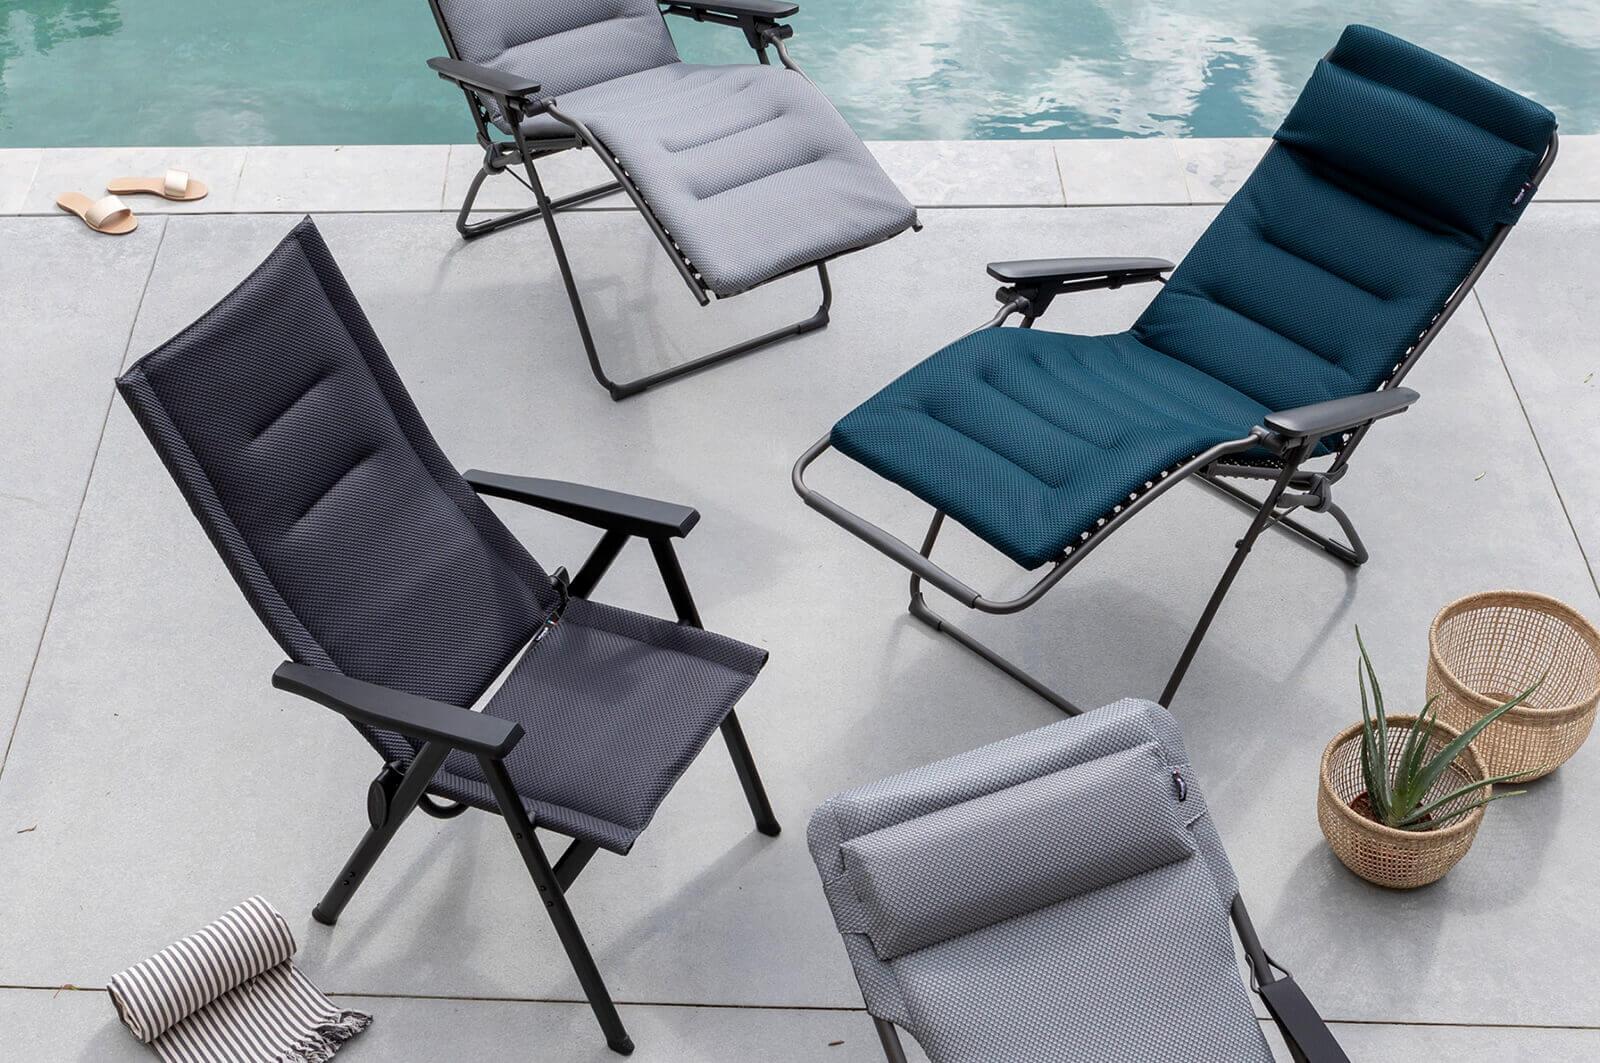 relax-et-fauteuil-lafuma-clacime-1600